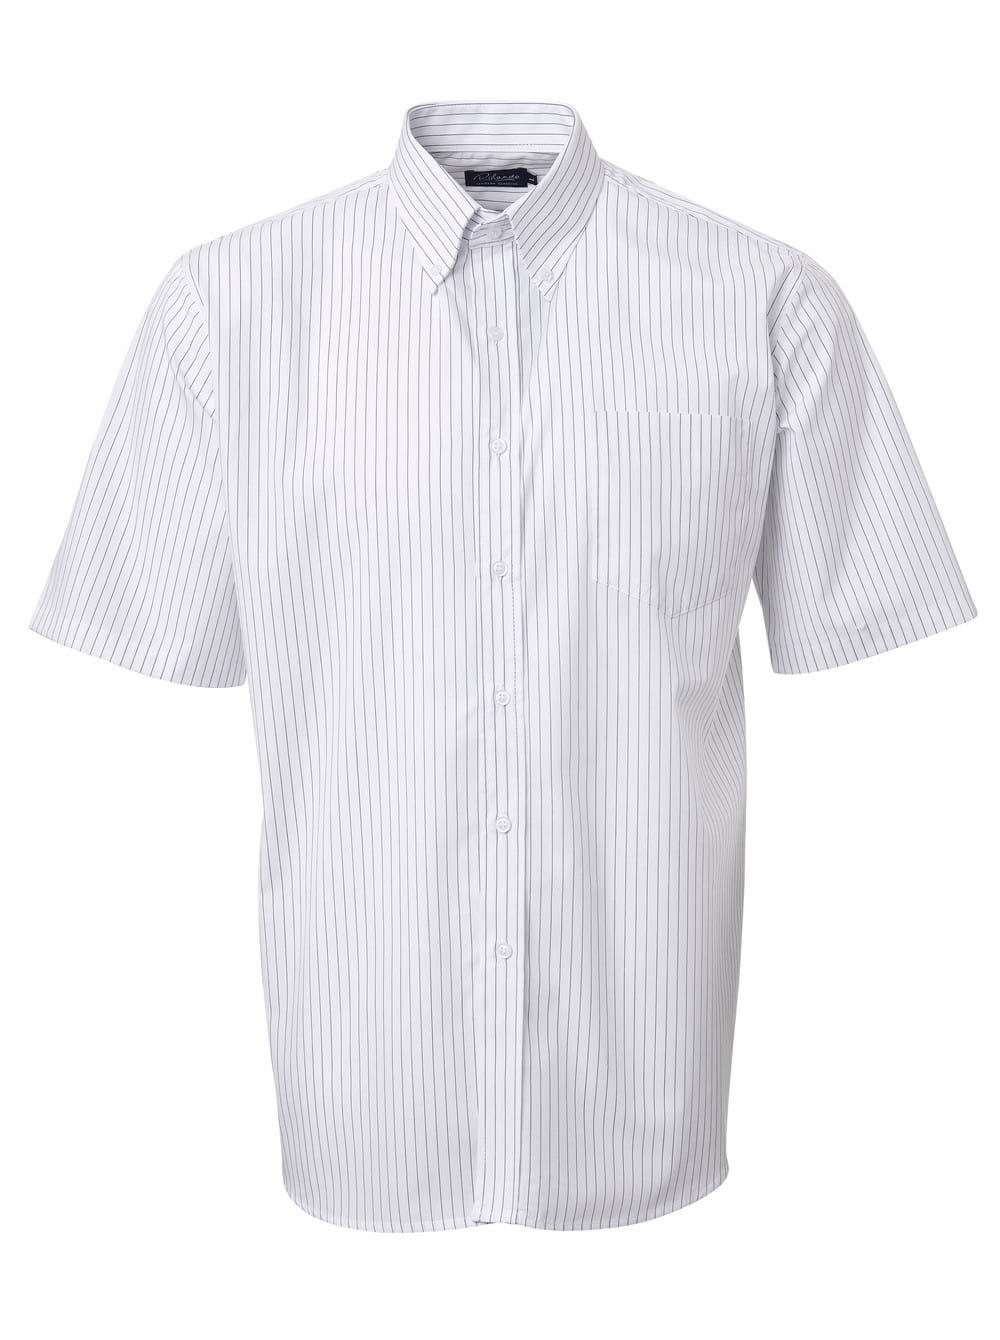 Mens Stripe Short Sleeve Shirt White